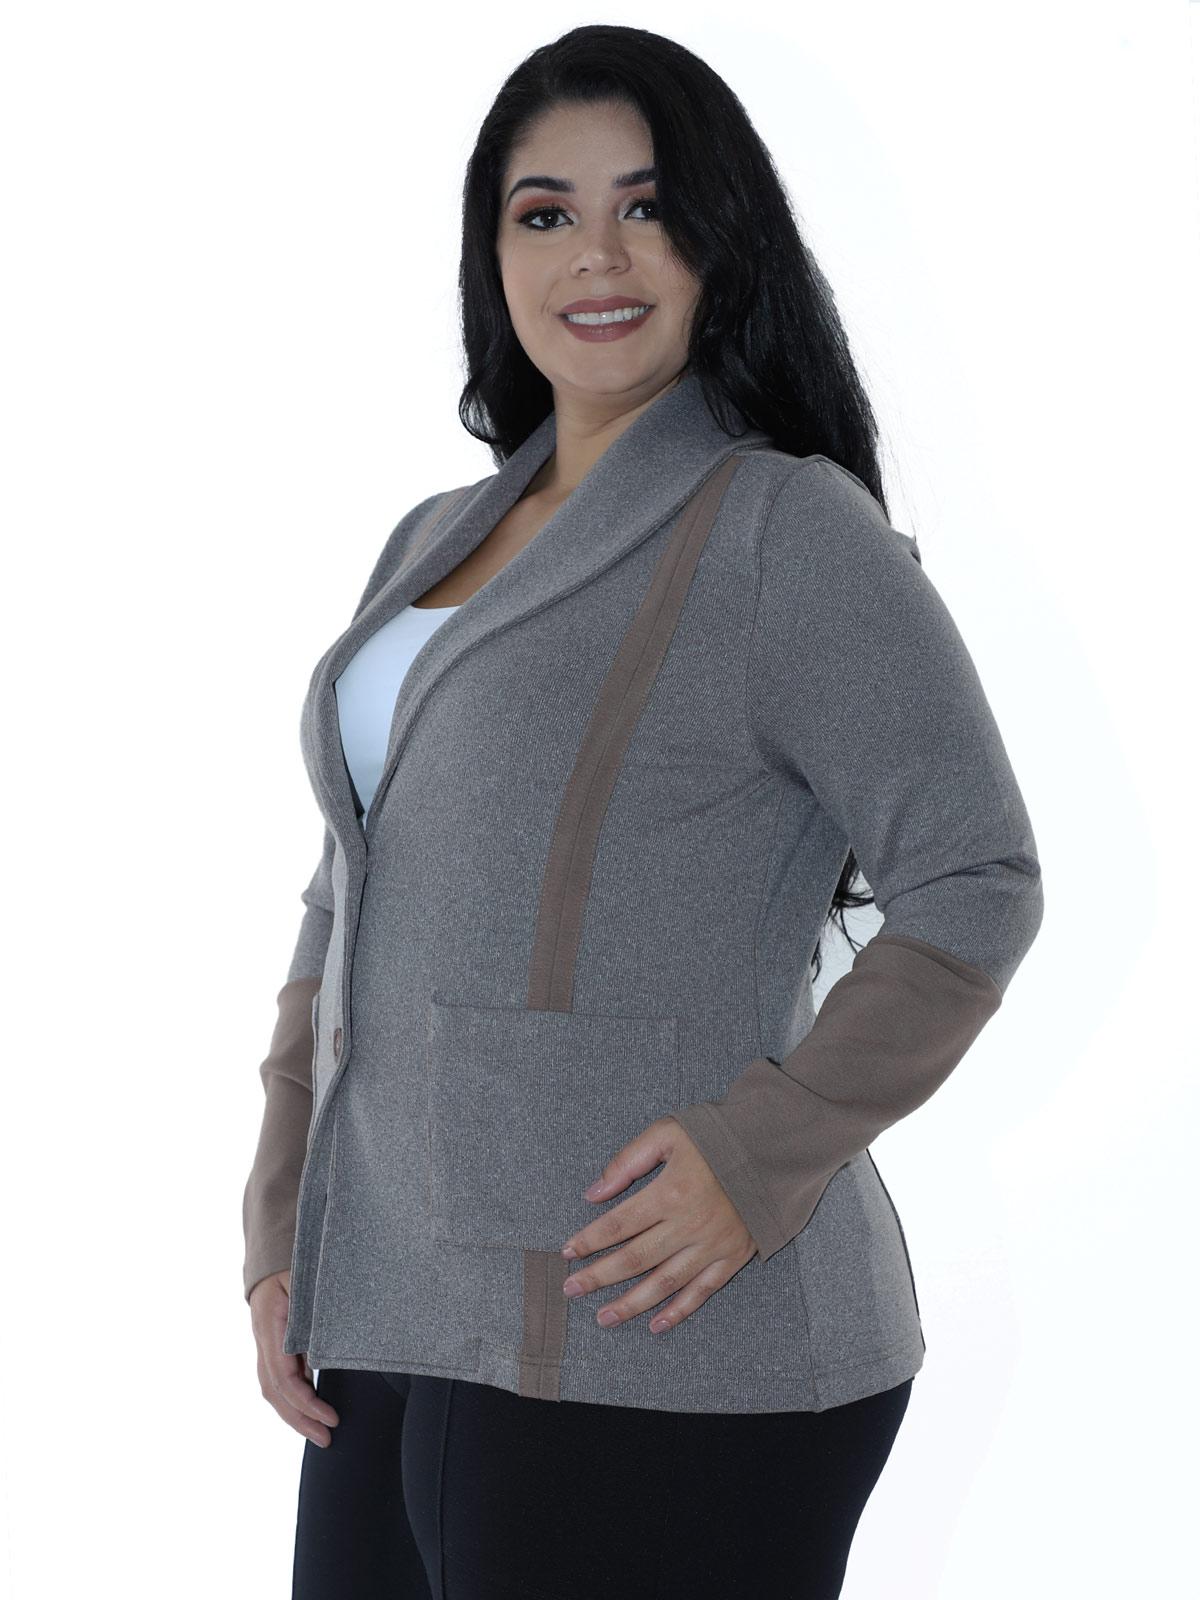 Casaco Plus Size Feminino Neoprene Dupla Face Areia